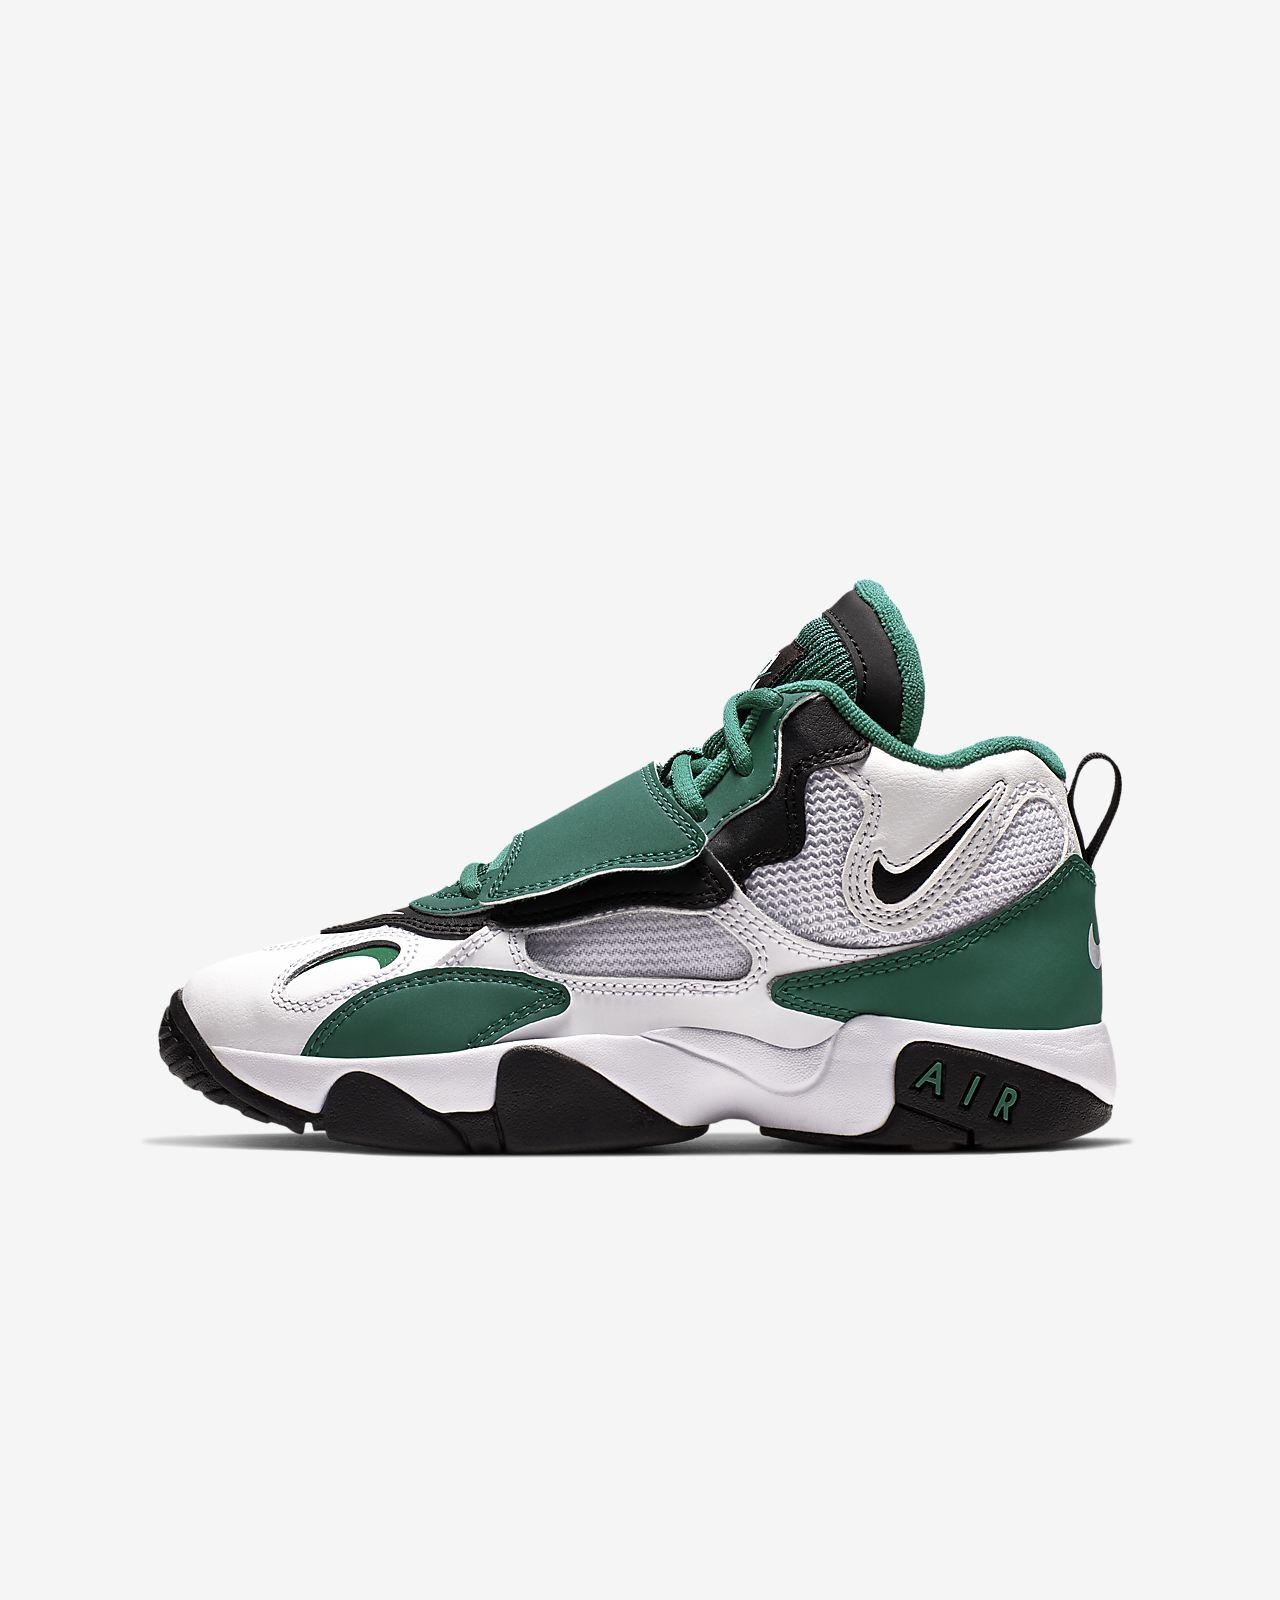 free shipping d80b1 24399 Big Kids  Shoe. Nike Air Max Speed Turf